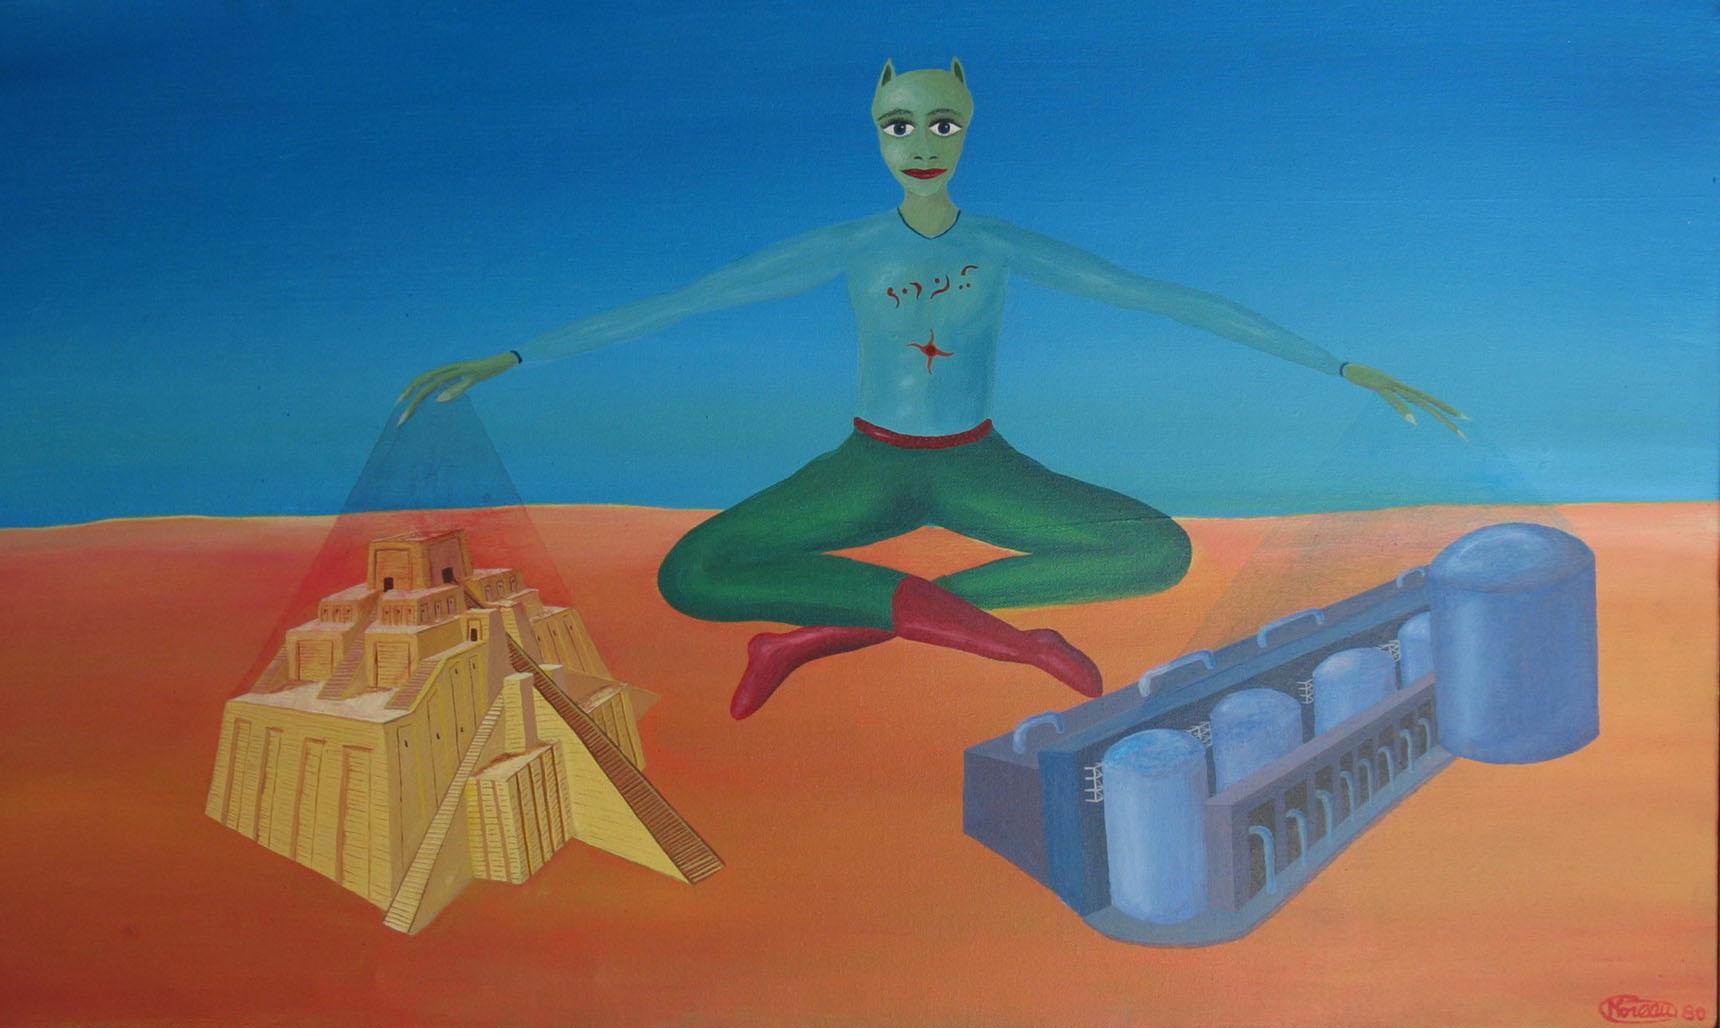 OmorO - Radiations - 1980